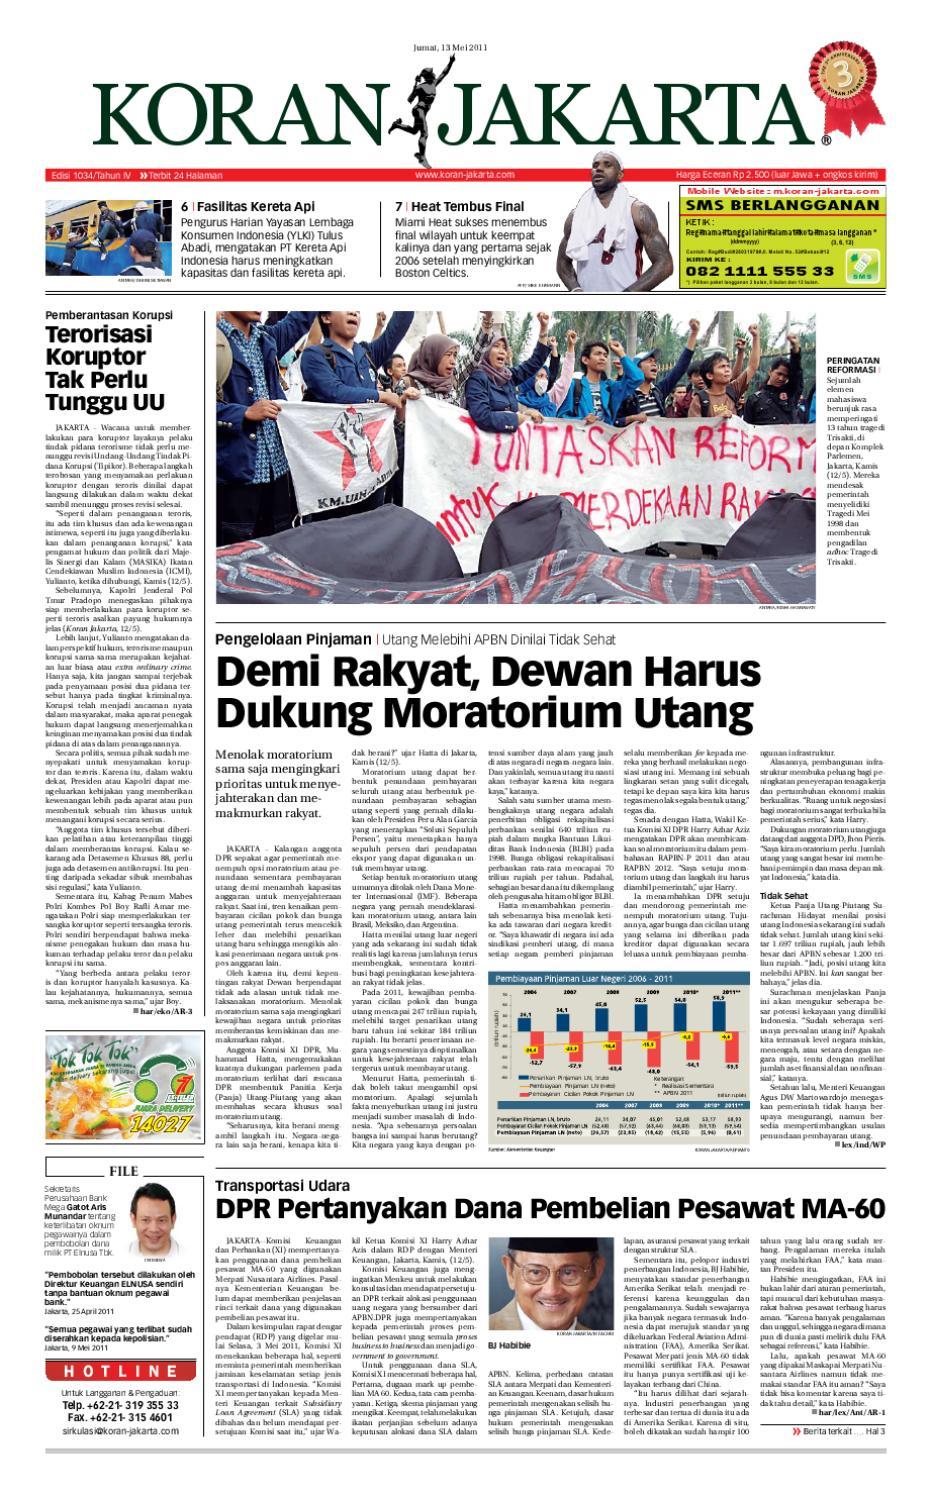 Edisi 1034 13 Mei 2011 By Pt Berita Nusantara Issuu Produk Ukm Bumn Kain Batik Middle Premium Sutera